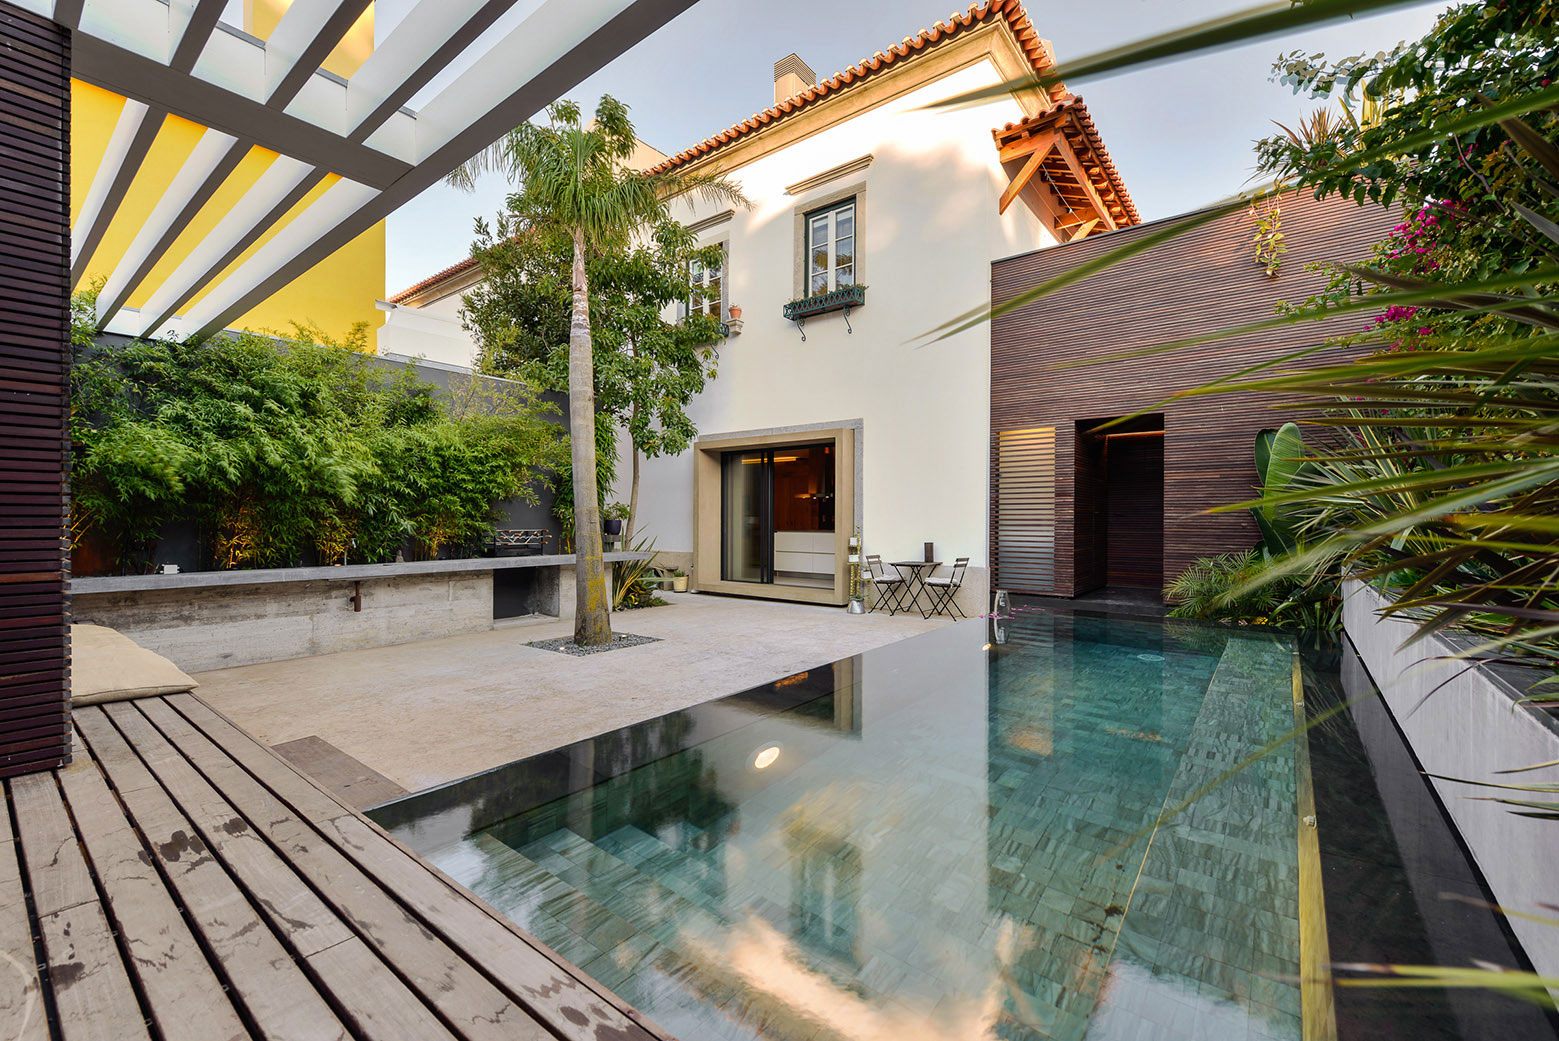 Renovation of a 1923 House in Estoril by Ricardo Moreno Arquitectos-06